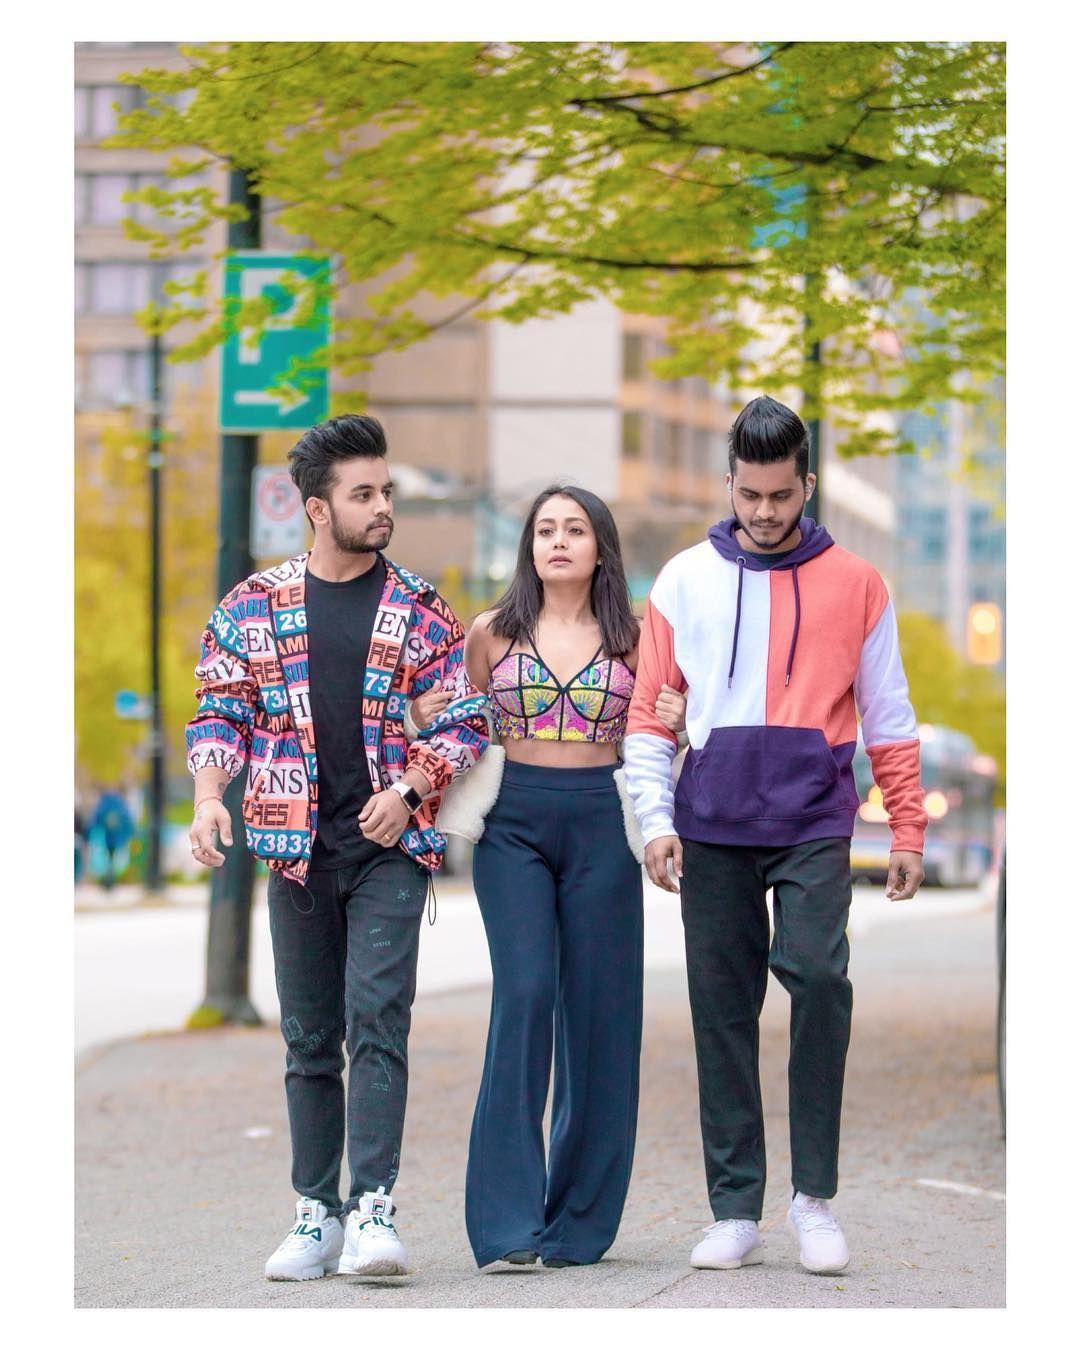 Neha Kakkar is dating an Indian Idol contestant, Neha